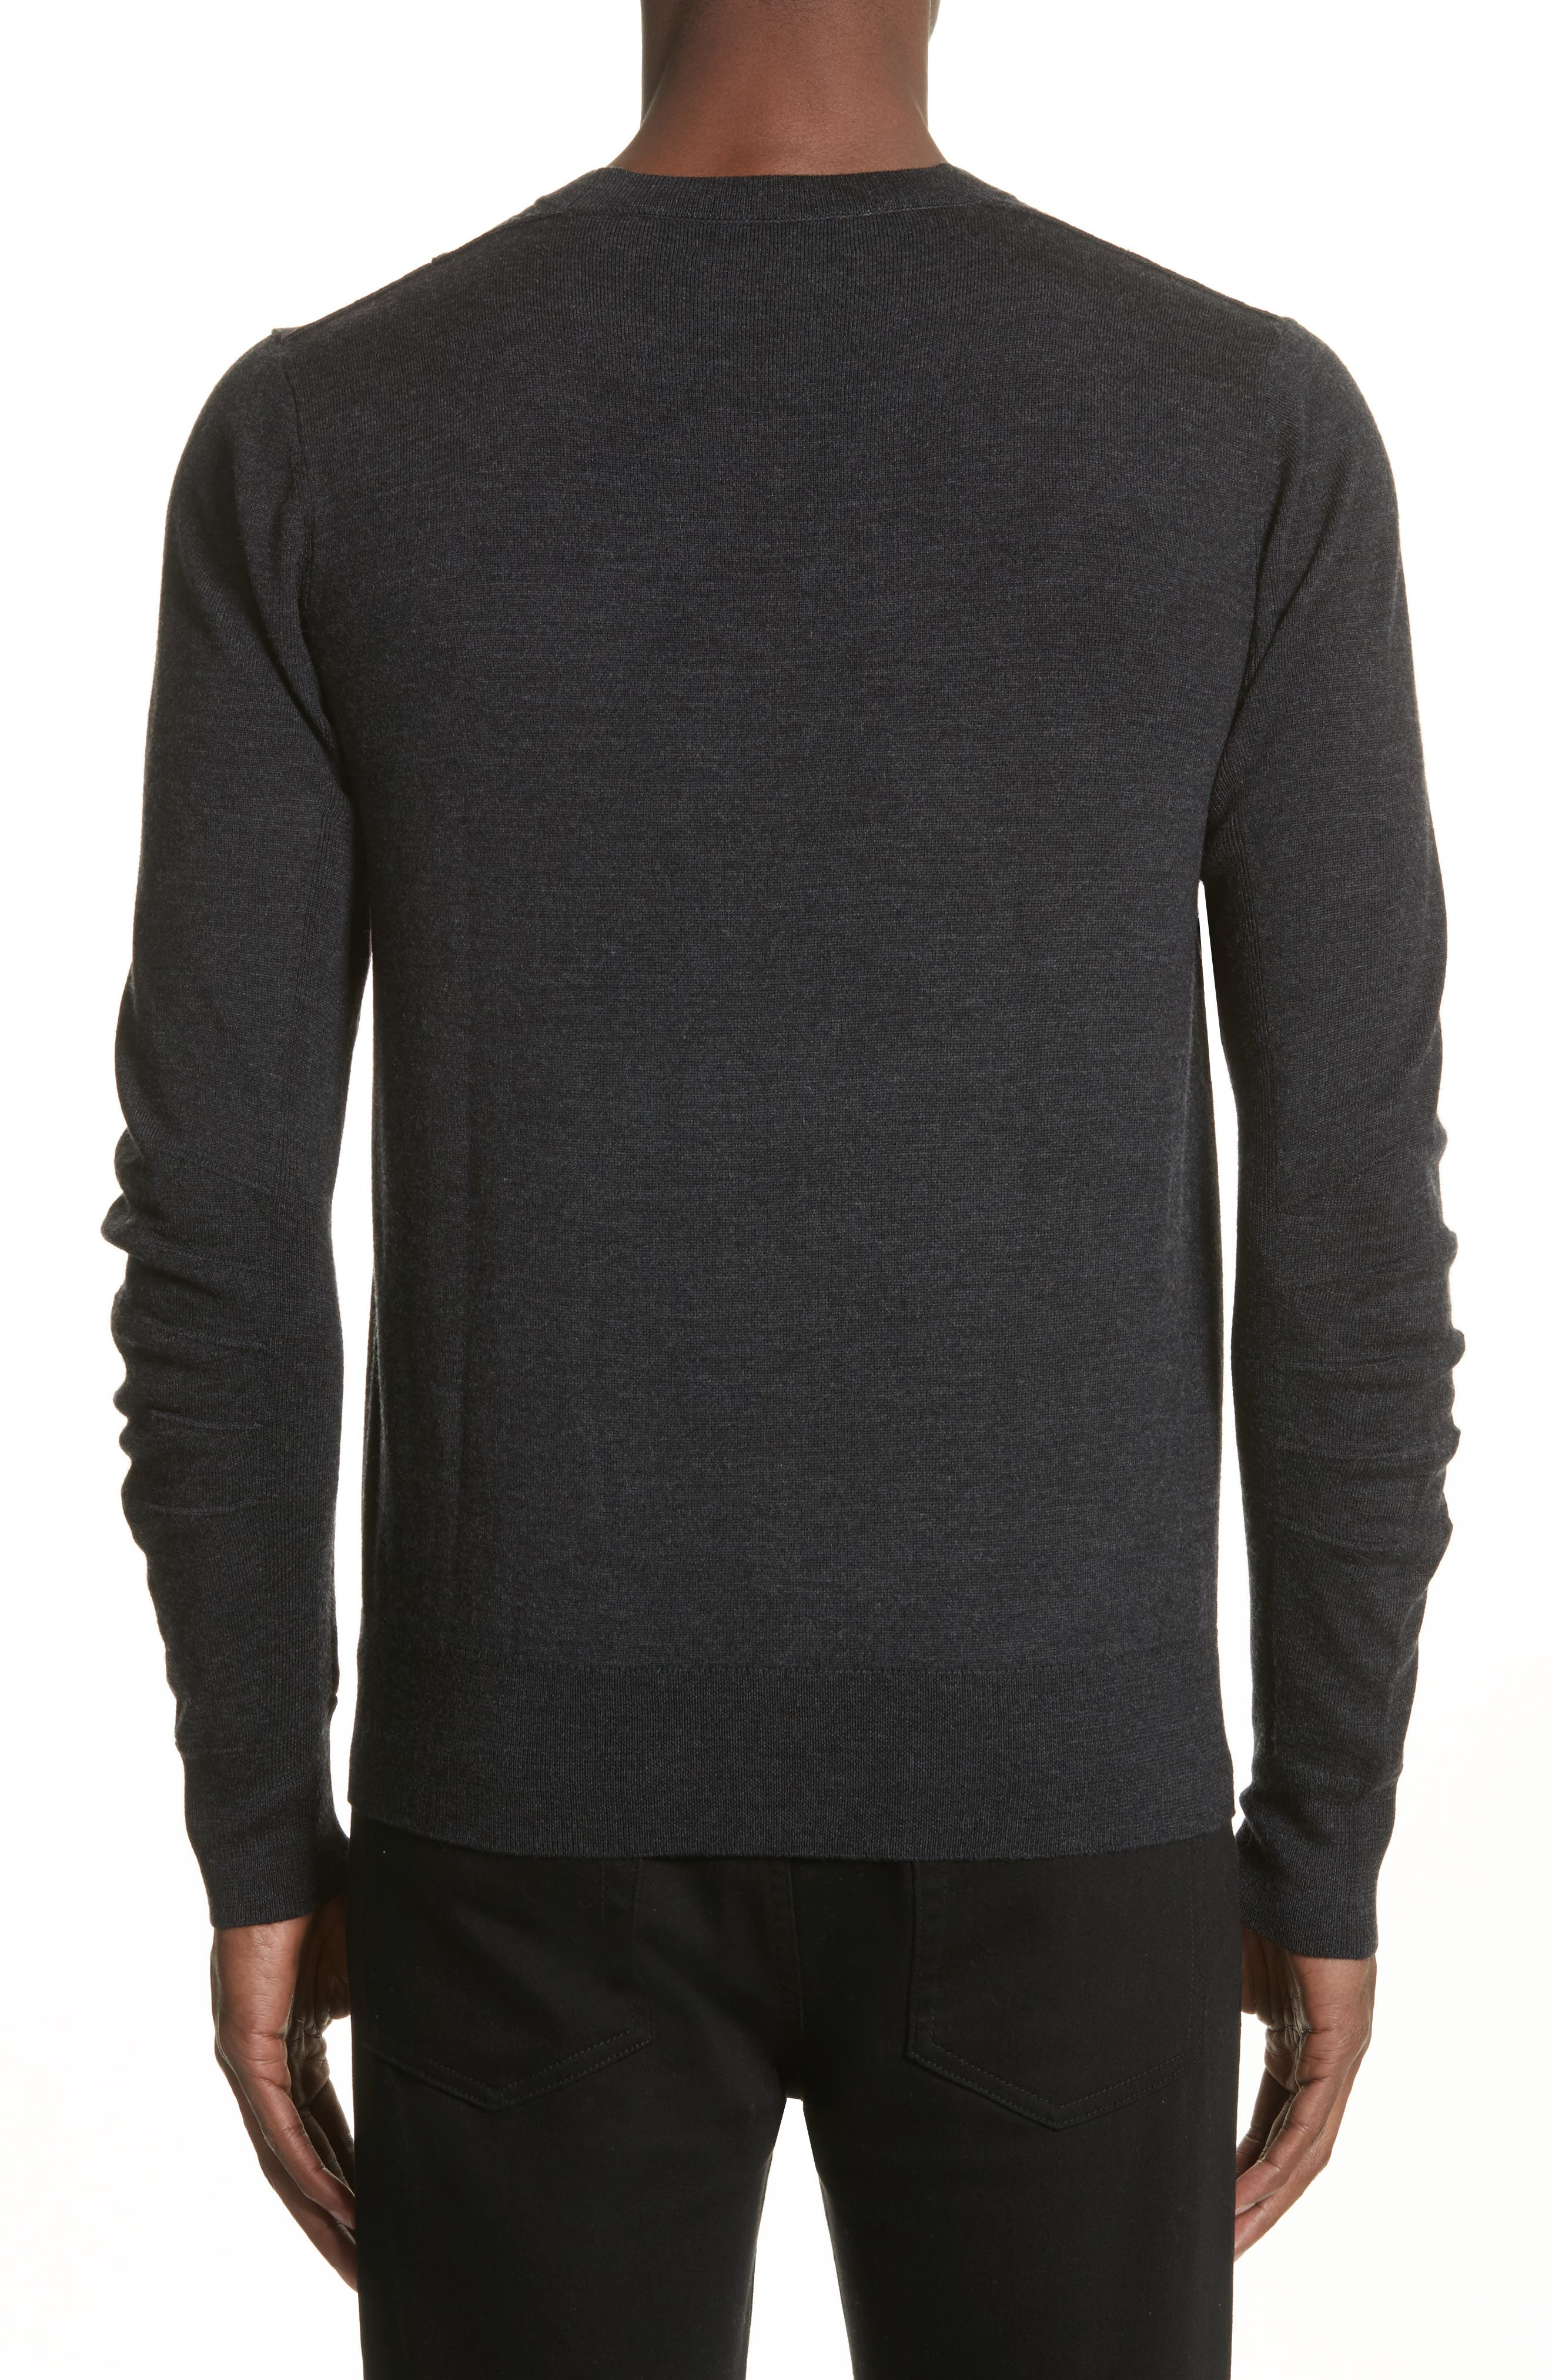 Carter Merino Wool Crewneck Sweater,                             Alternate thumbnail 5, color,